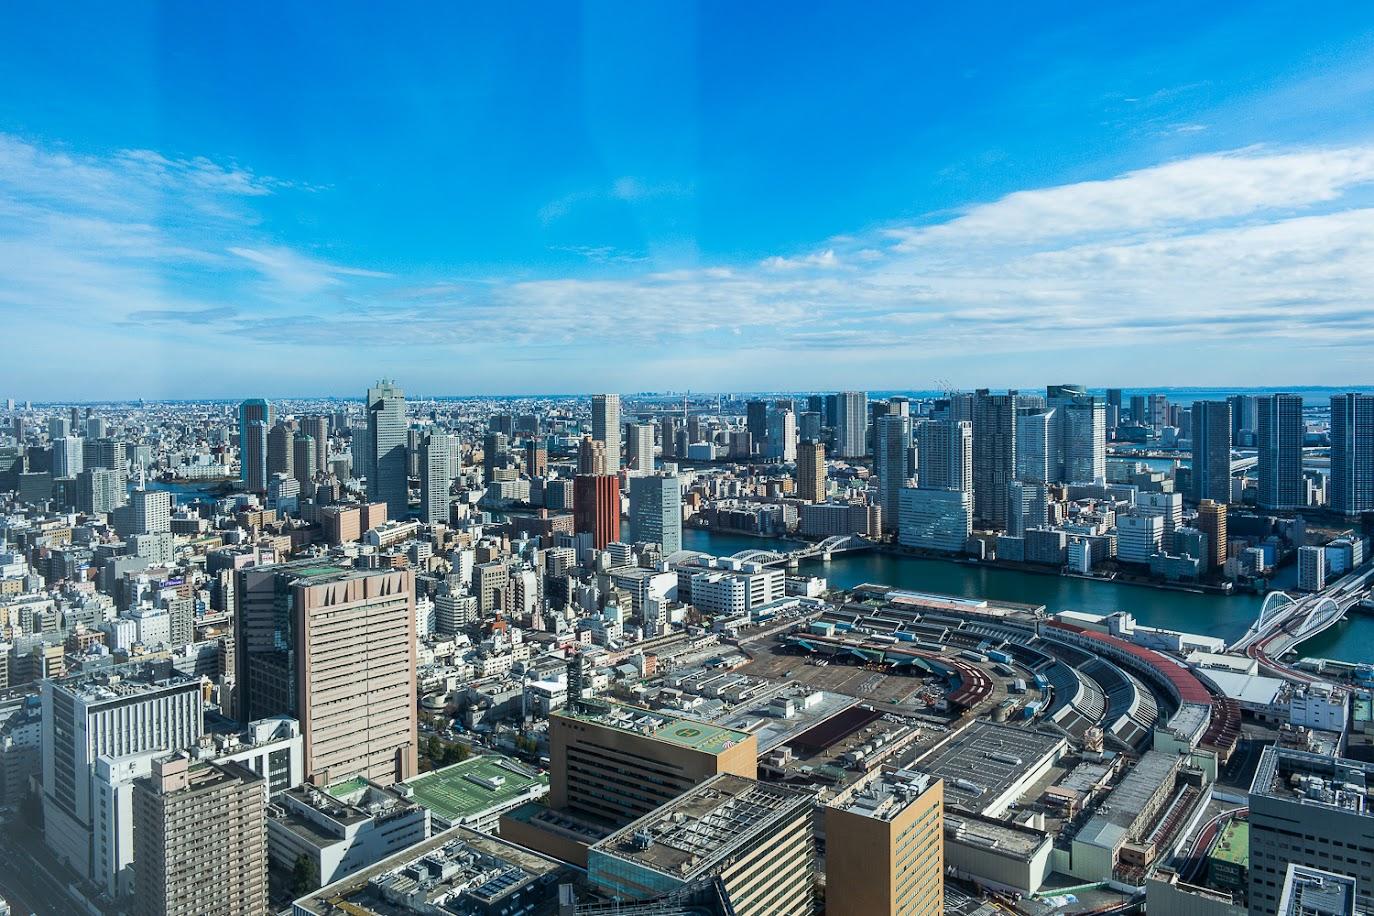 Стать севера (Эношима-Камакура-Токио-Окутама-Ямадера-Мацушима-Минамисанрику-Ичиносеки-Хираизуми-Какунодате-Айзу). Декабрь 2018 - январь 2019.